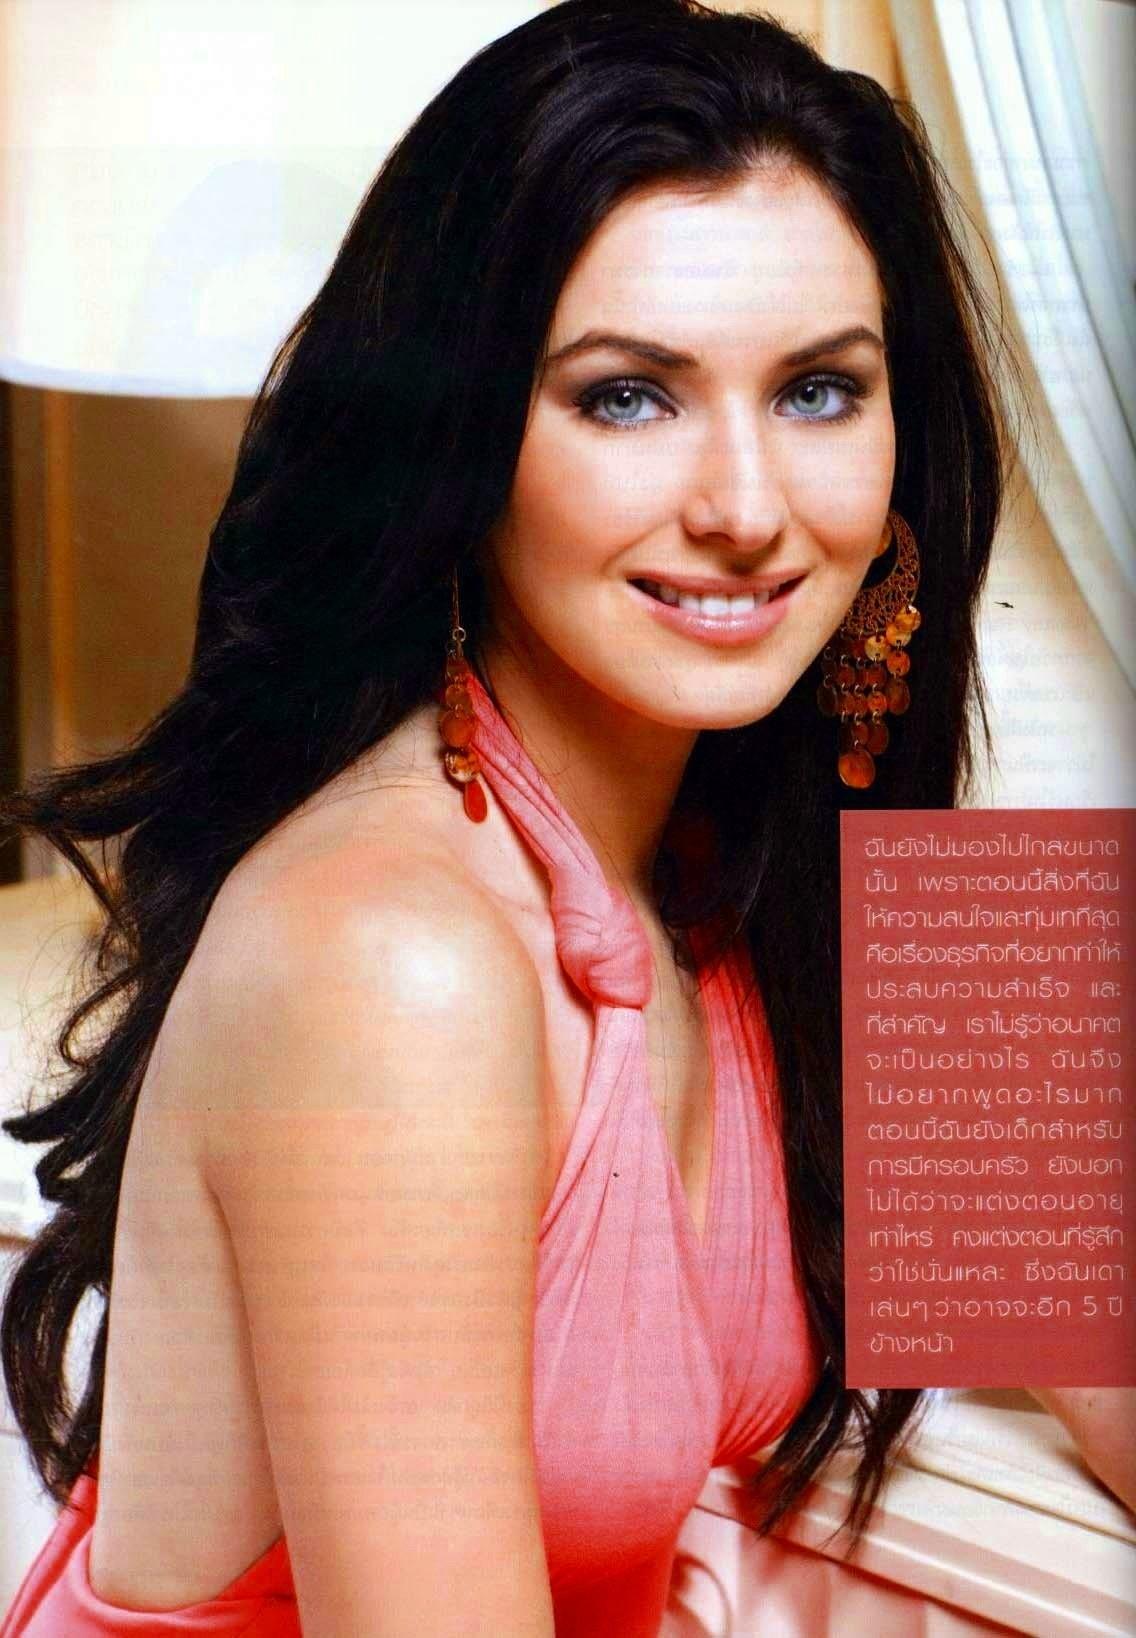 natalie glebova, miss universe 2005. - Página 3 Post-110